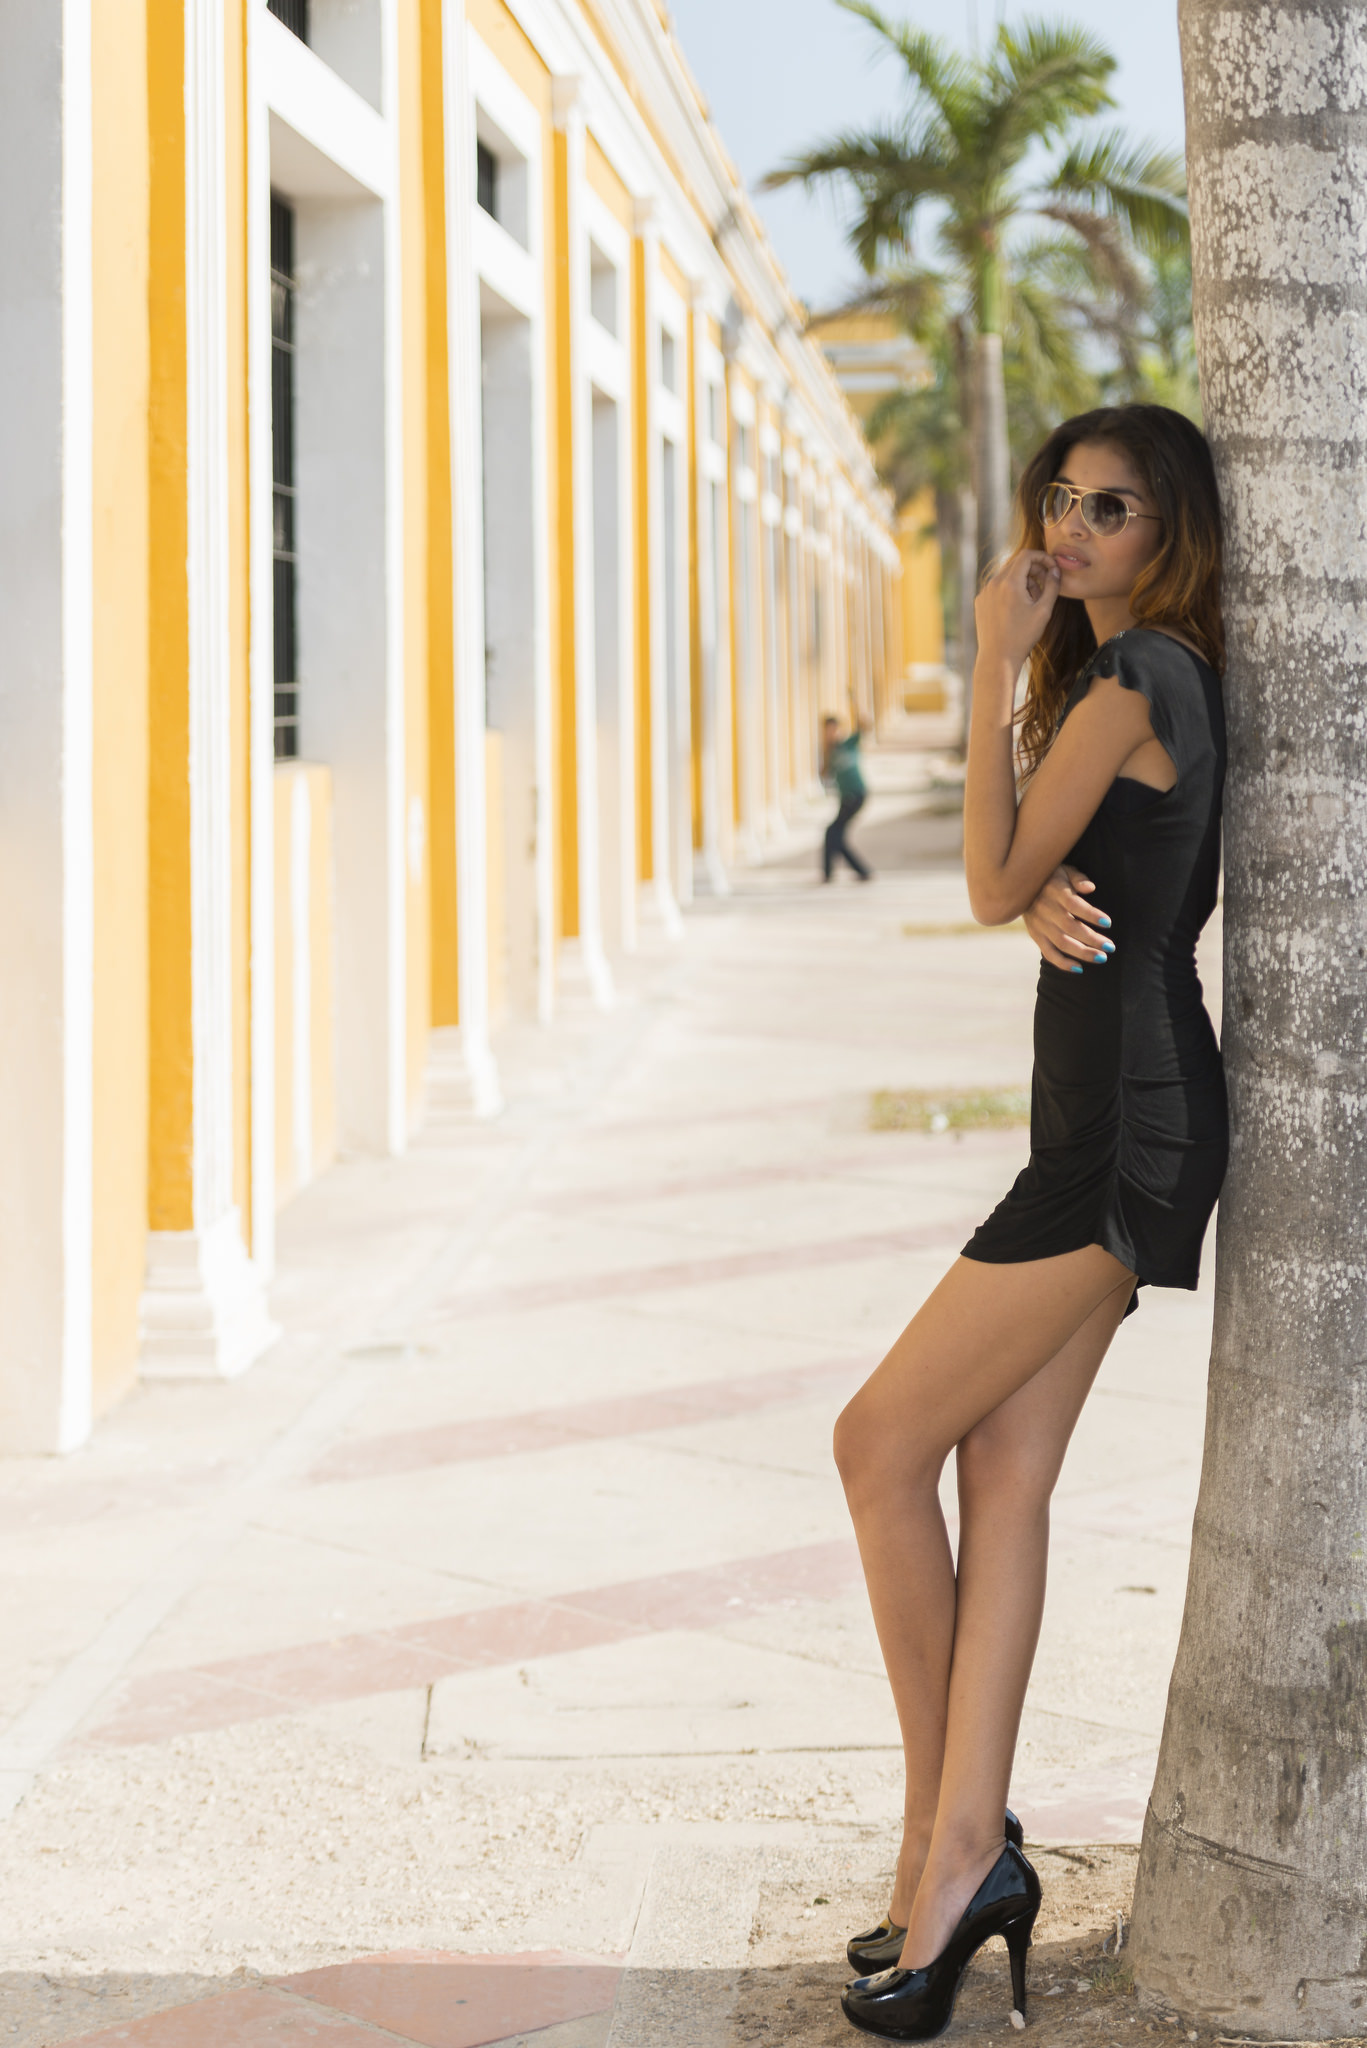 Barranquilla_Shooting_4